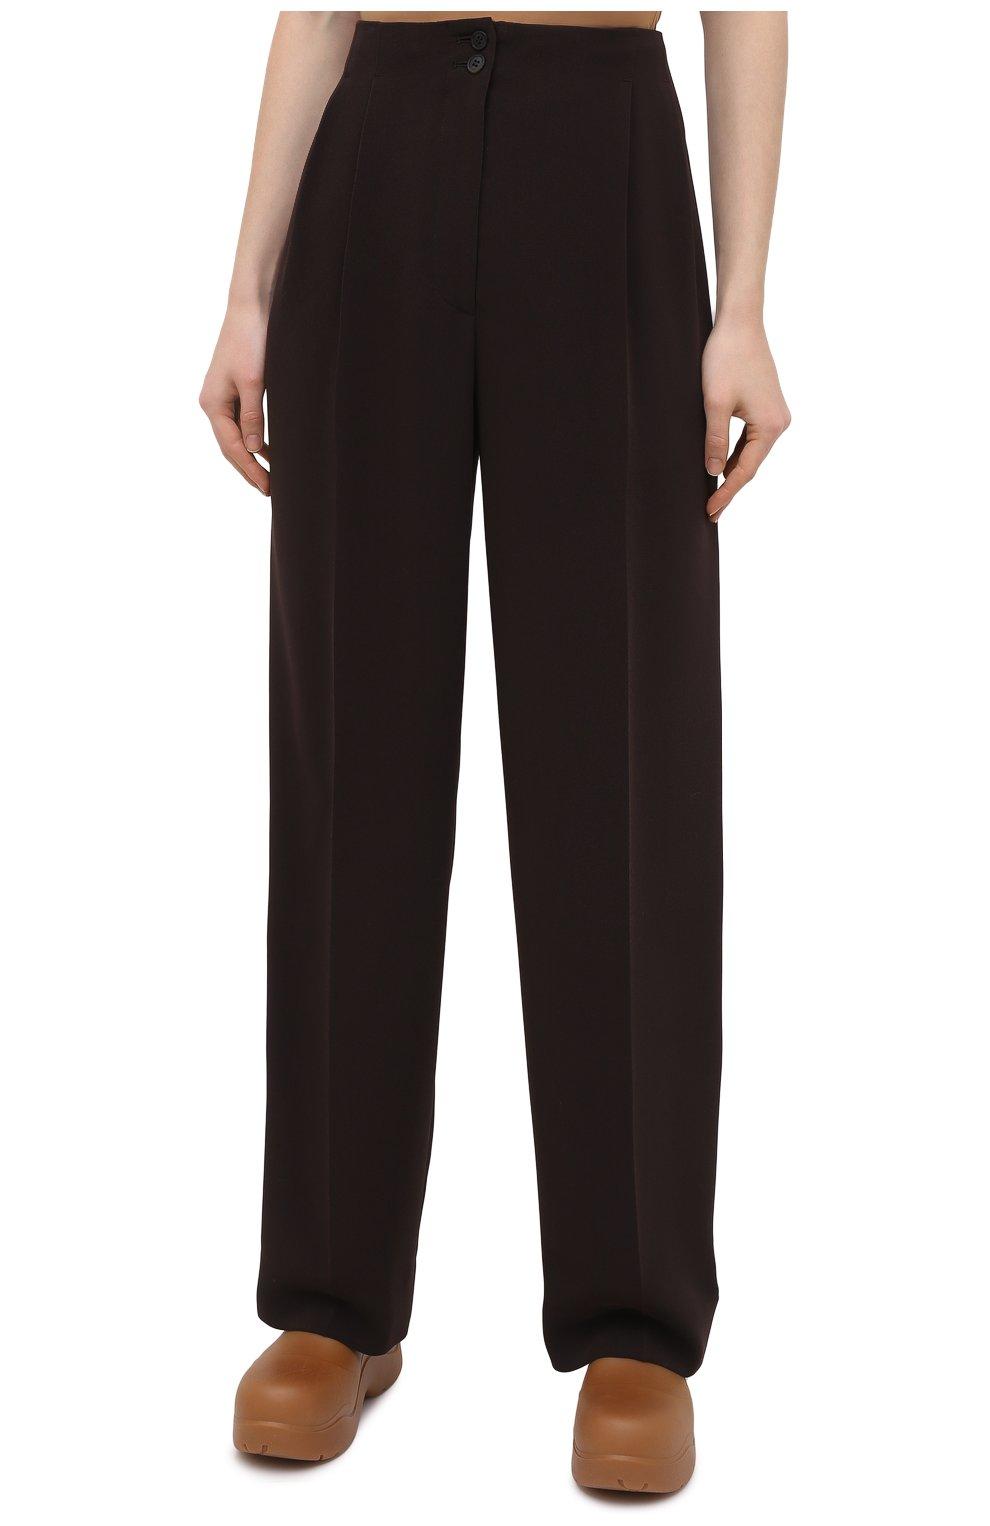 Женские брюки THE ROW темно-коричневого цвета, арт. 5475W1968   Фото 3